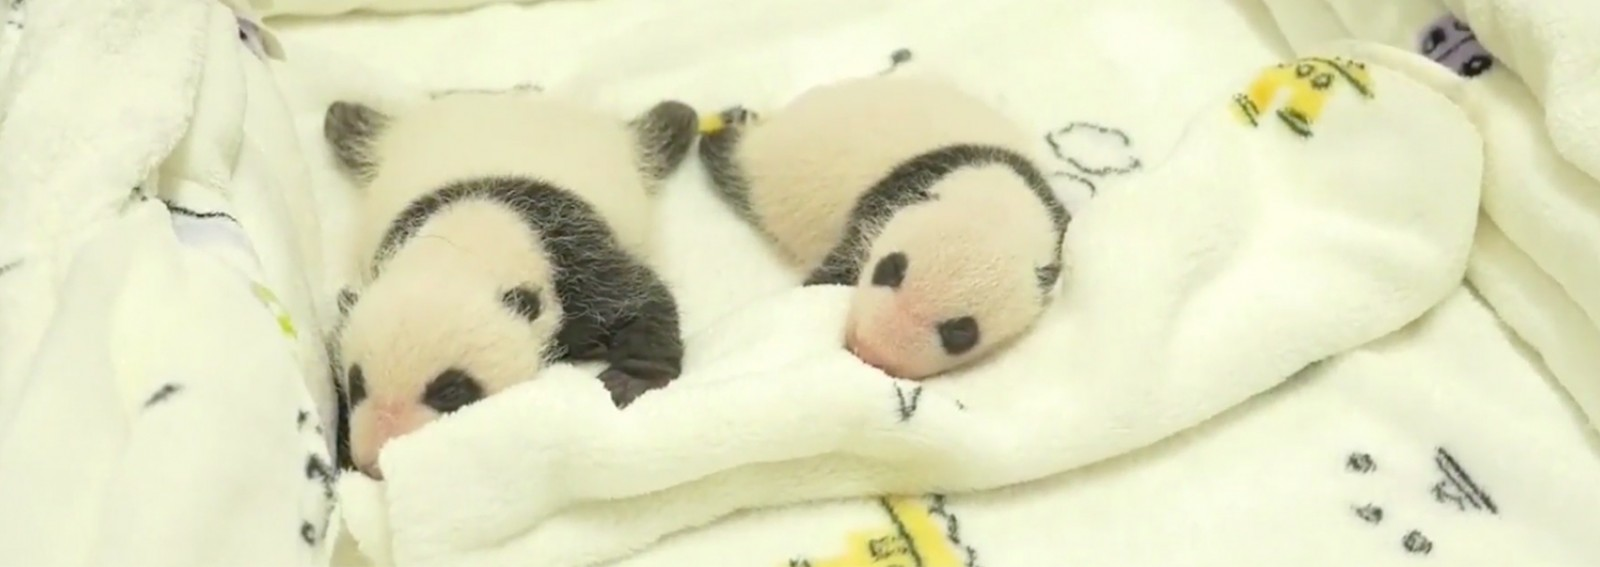 Adorable giant panda twins make their public debut